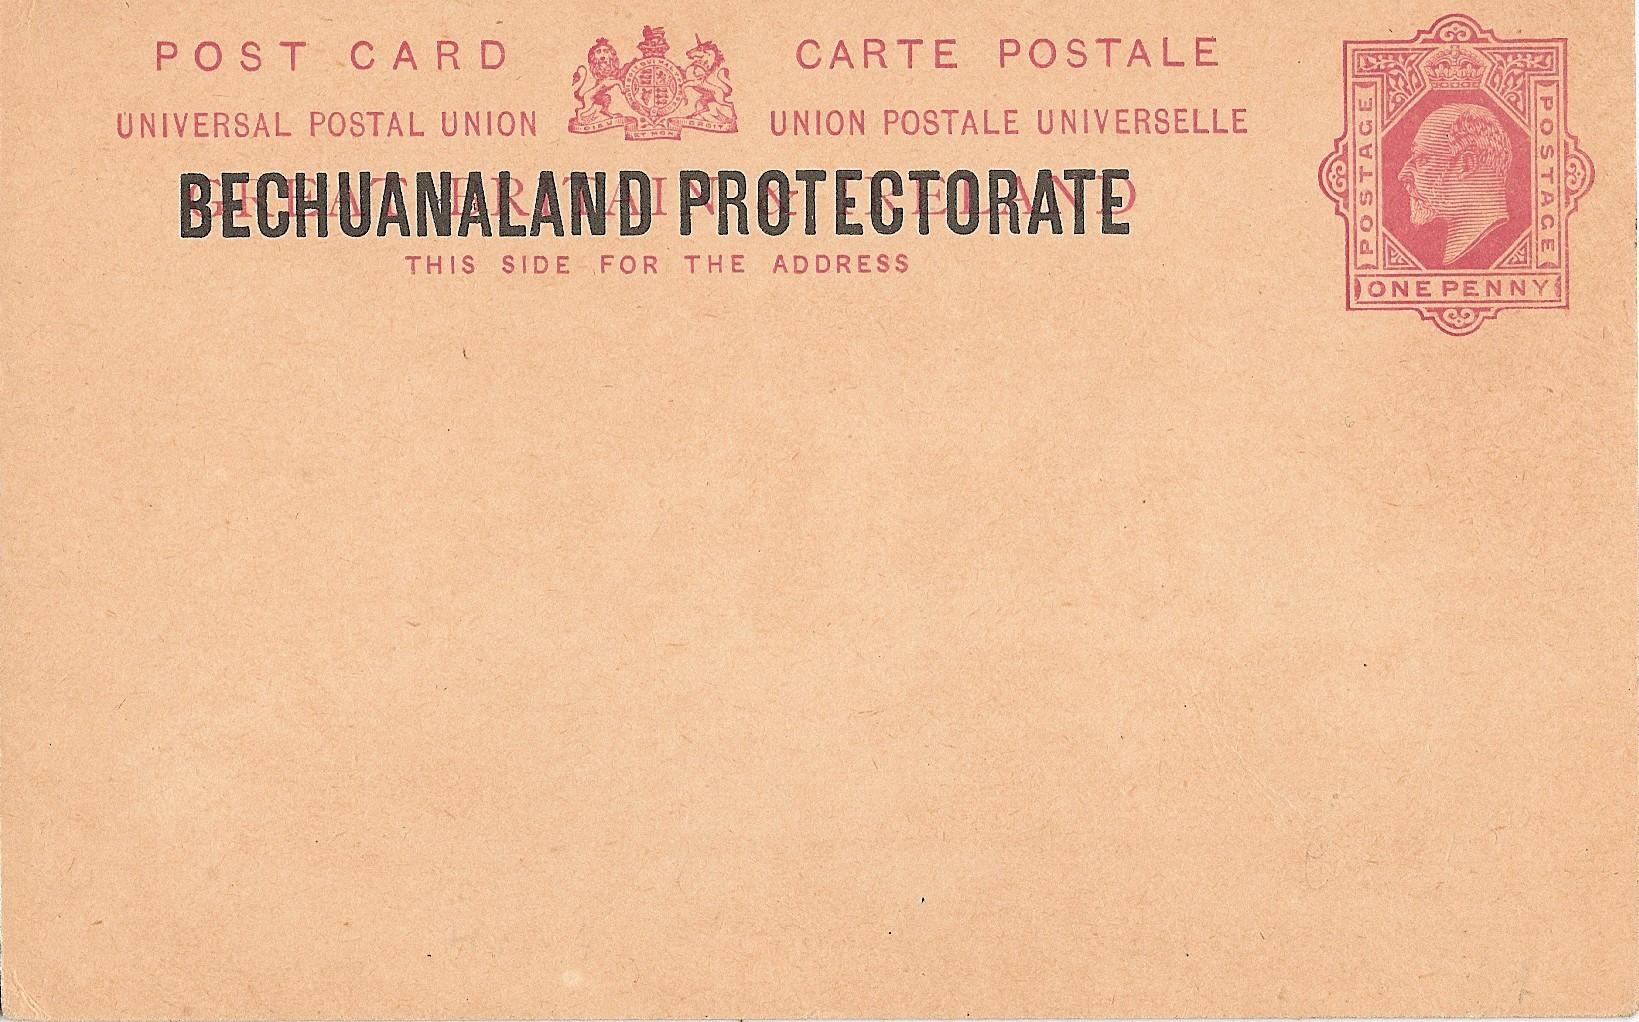 Bechuanaland Protectorate postcard E7 1d